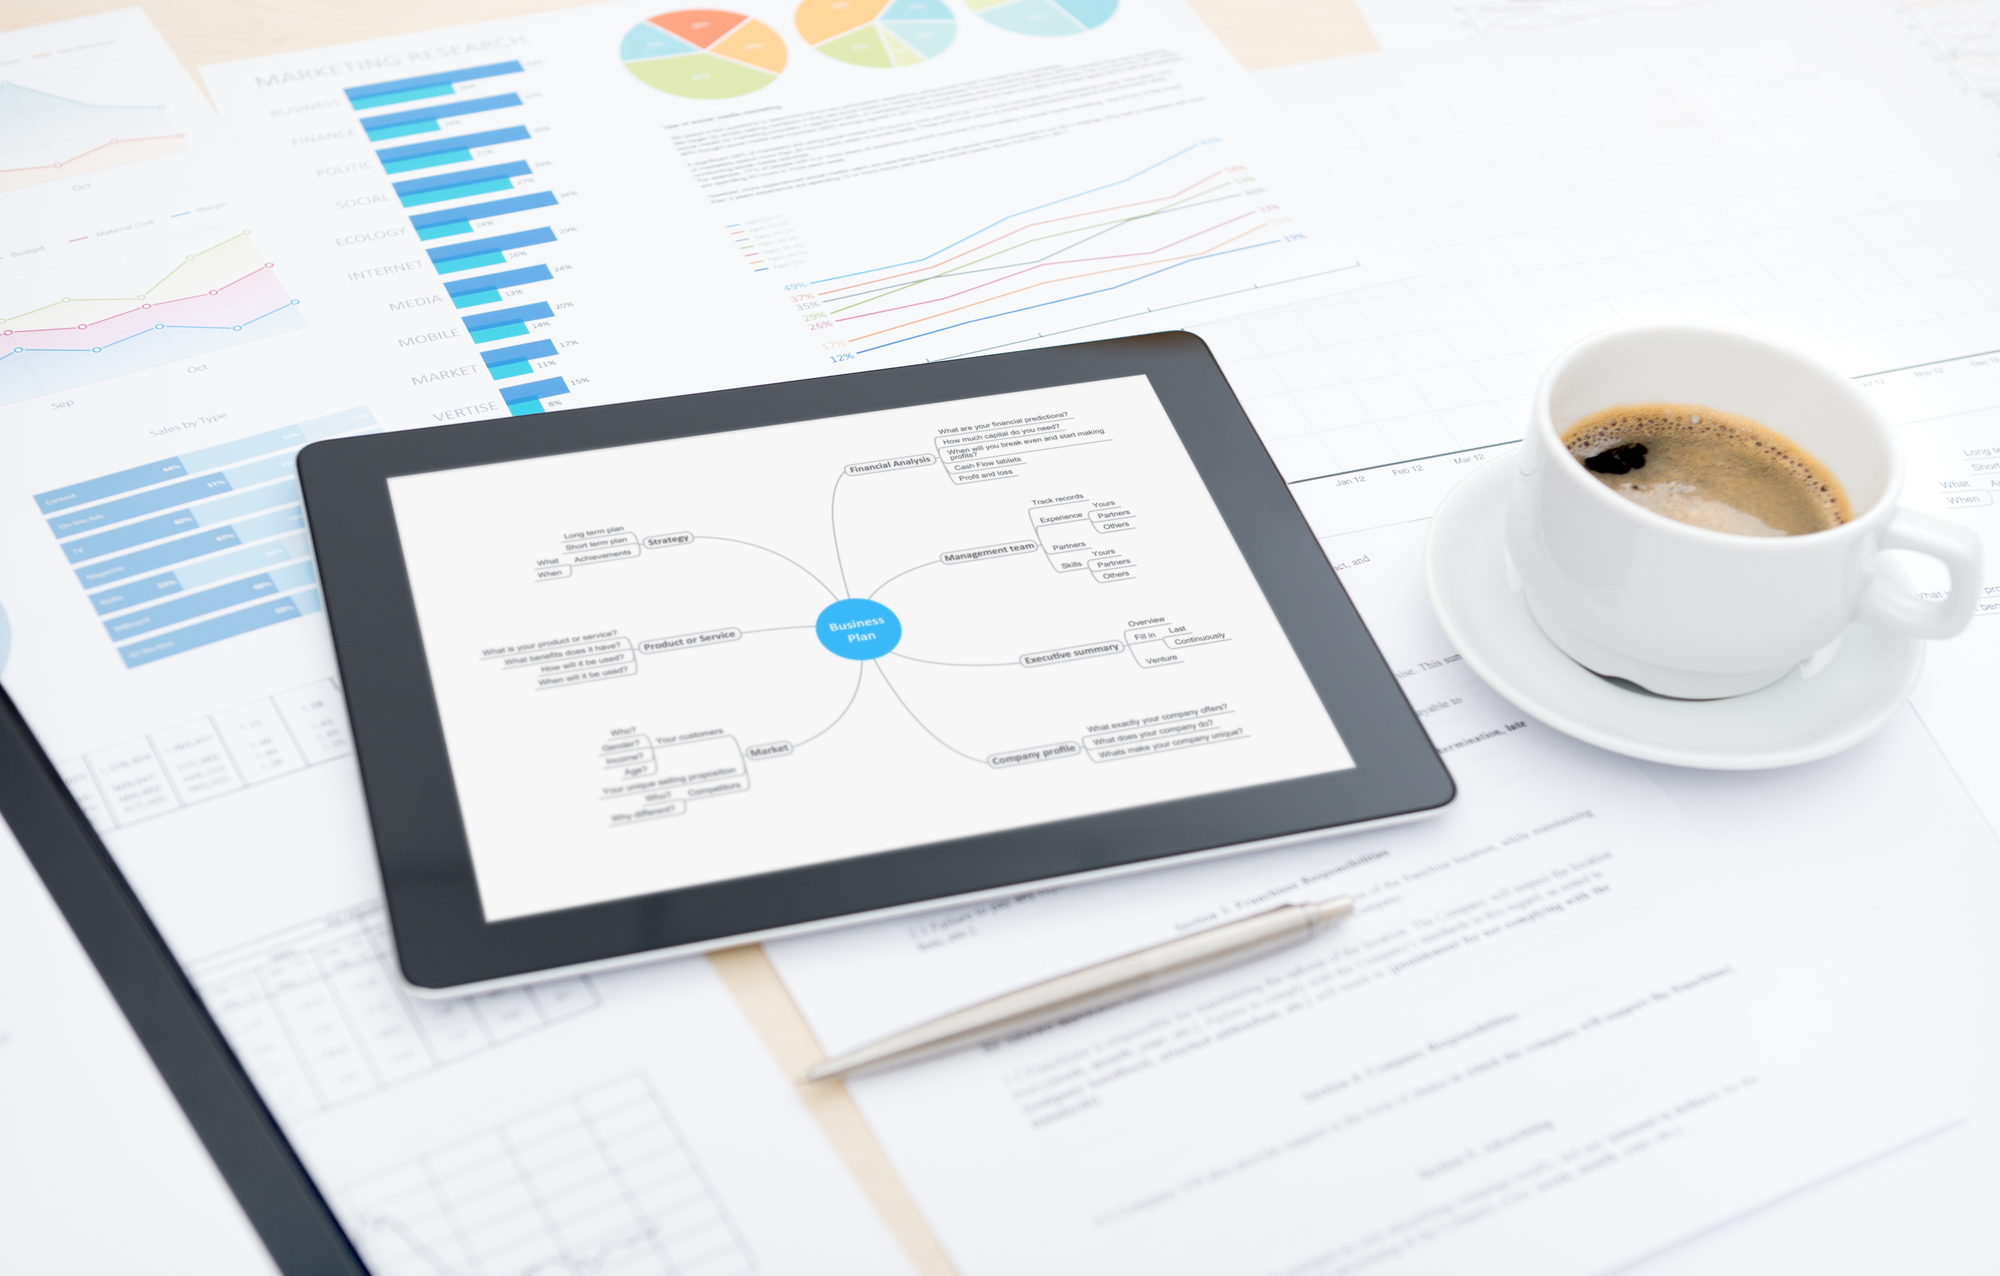 business-intelligence-tools-2